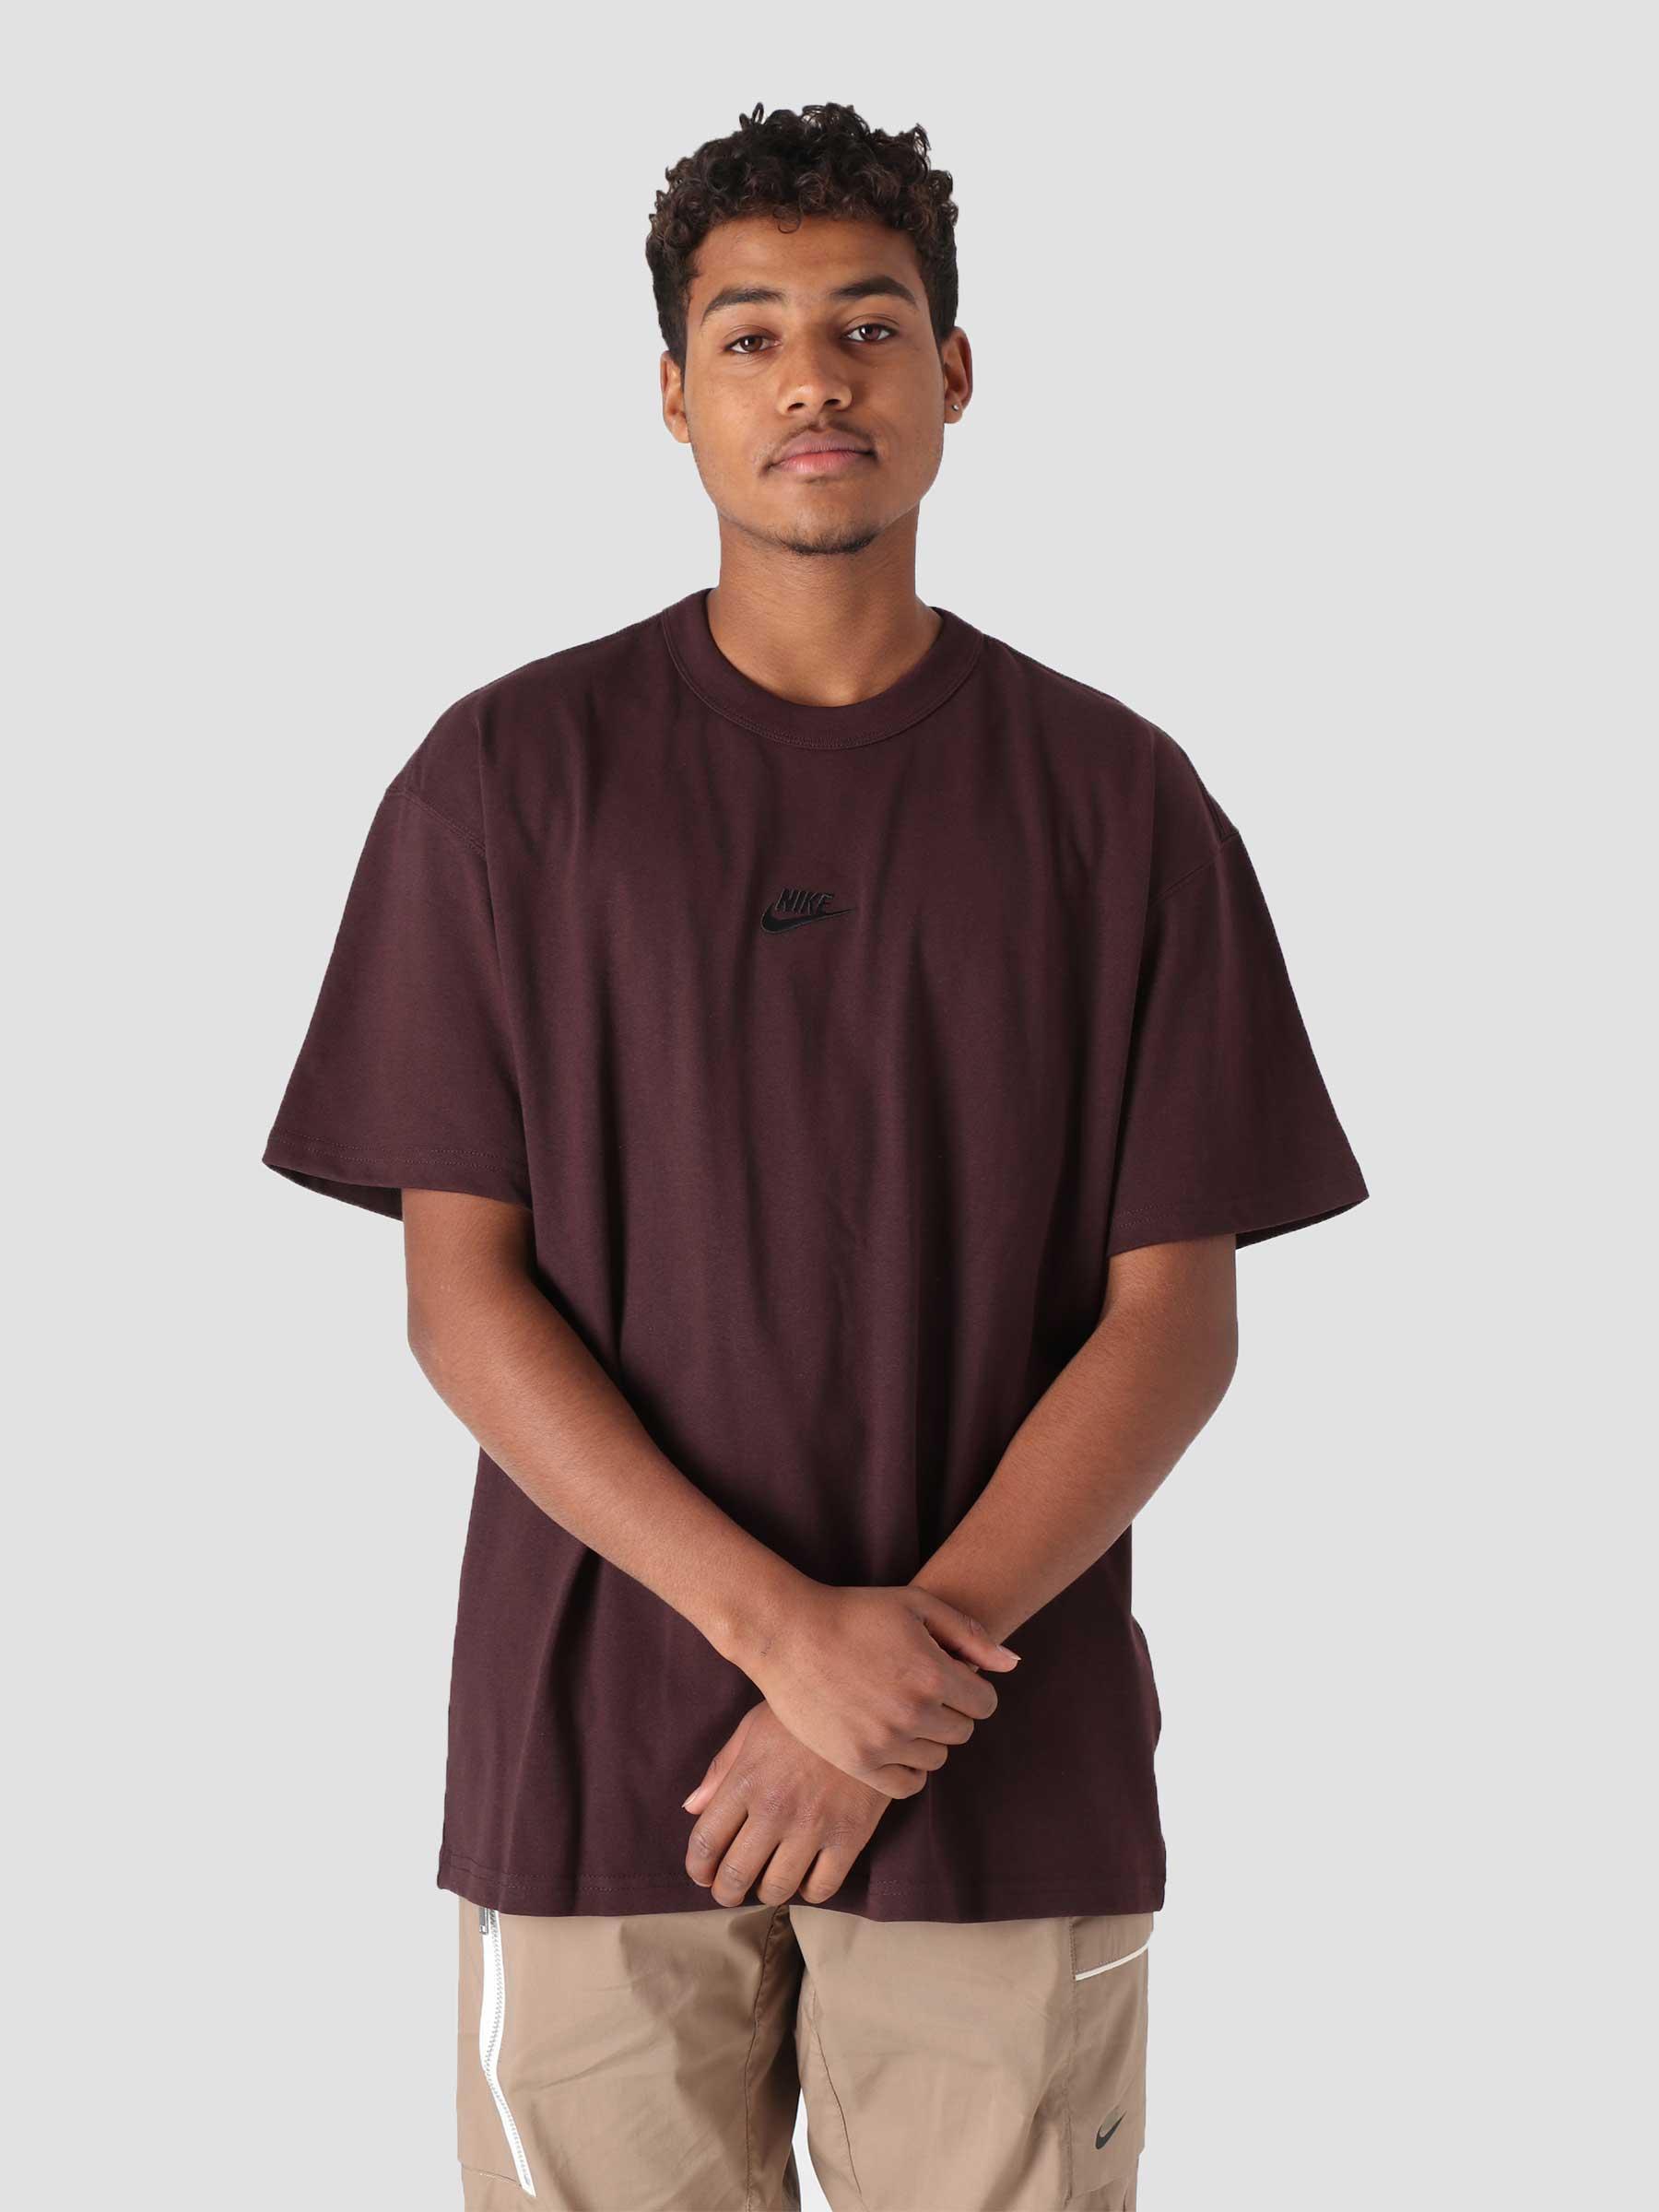 M NSW T-Shirt Premium Essential Brown Basalt Black DB3193-203